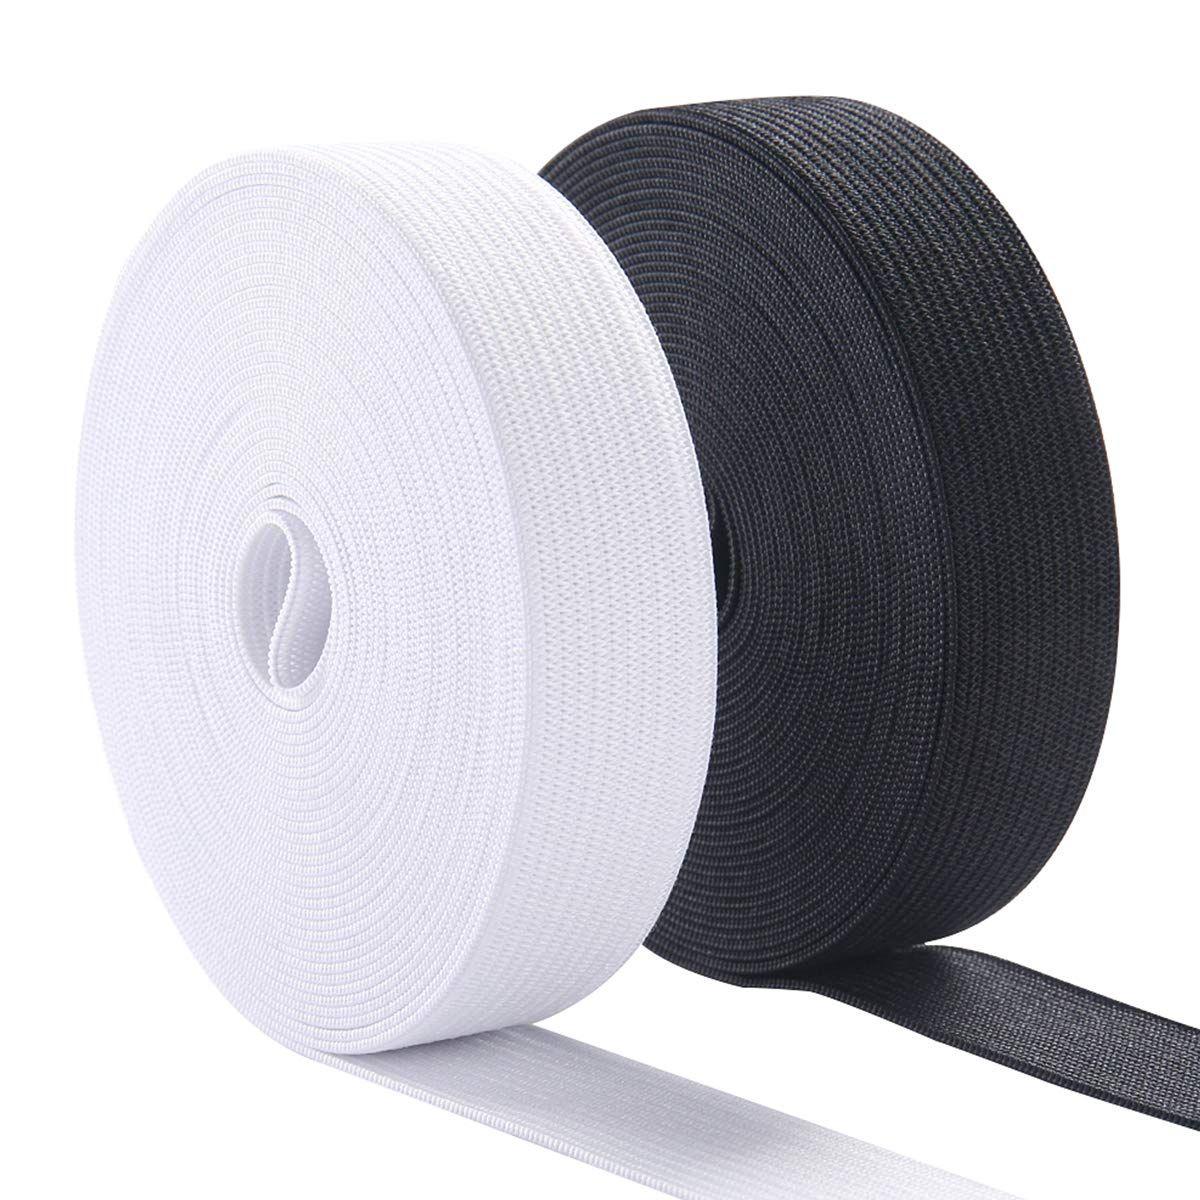 Sewing Elastic Band 3 4 Inch Wide Heavy Stretch High Elasticity